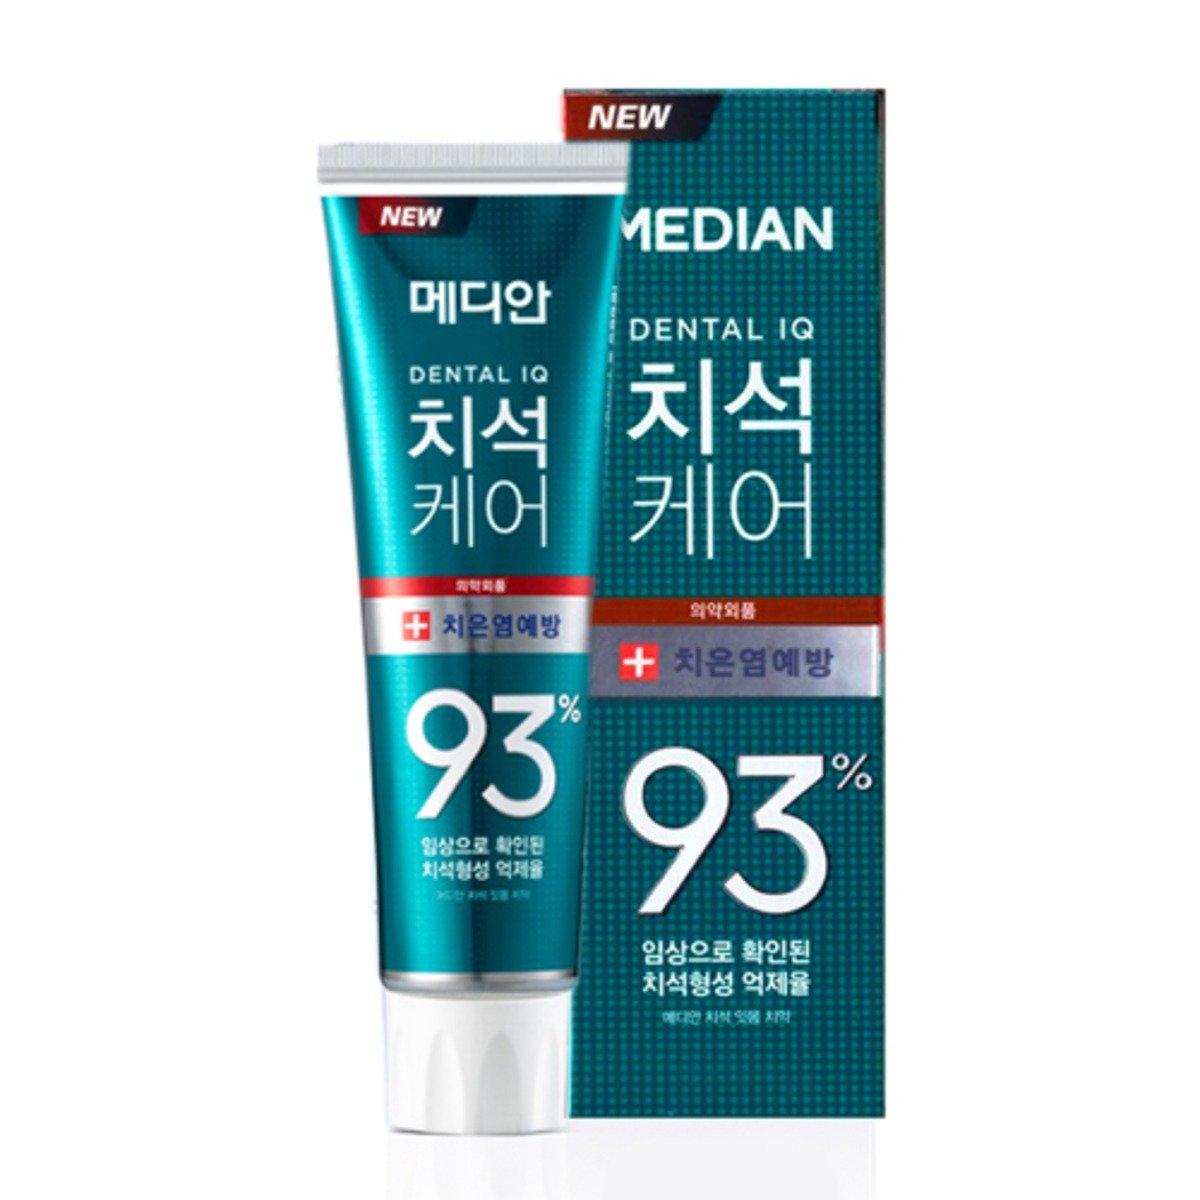 Median 牙石護理93 護齦牙膏 (綠色) 120g (此為平行進口產品)   [平行進口產品]